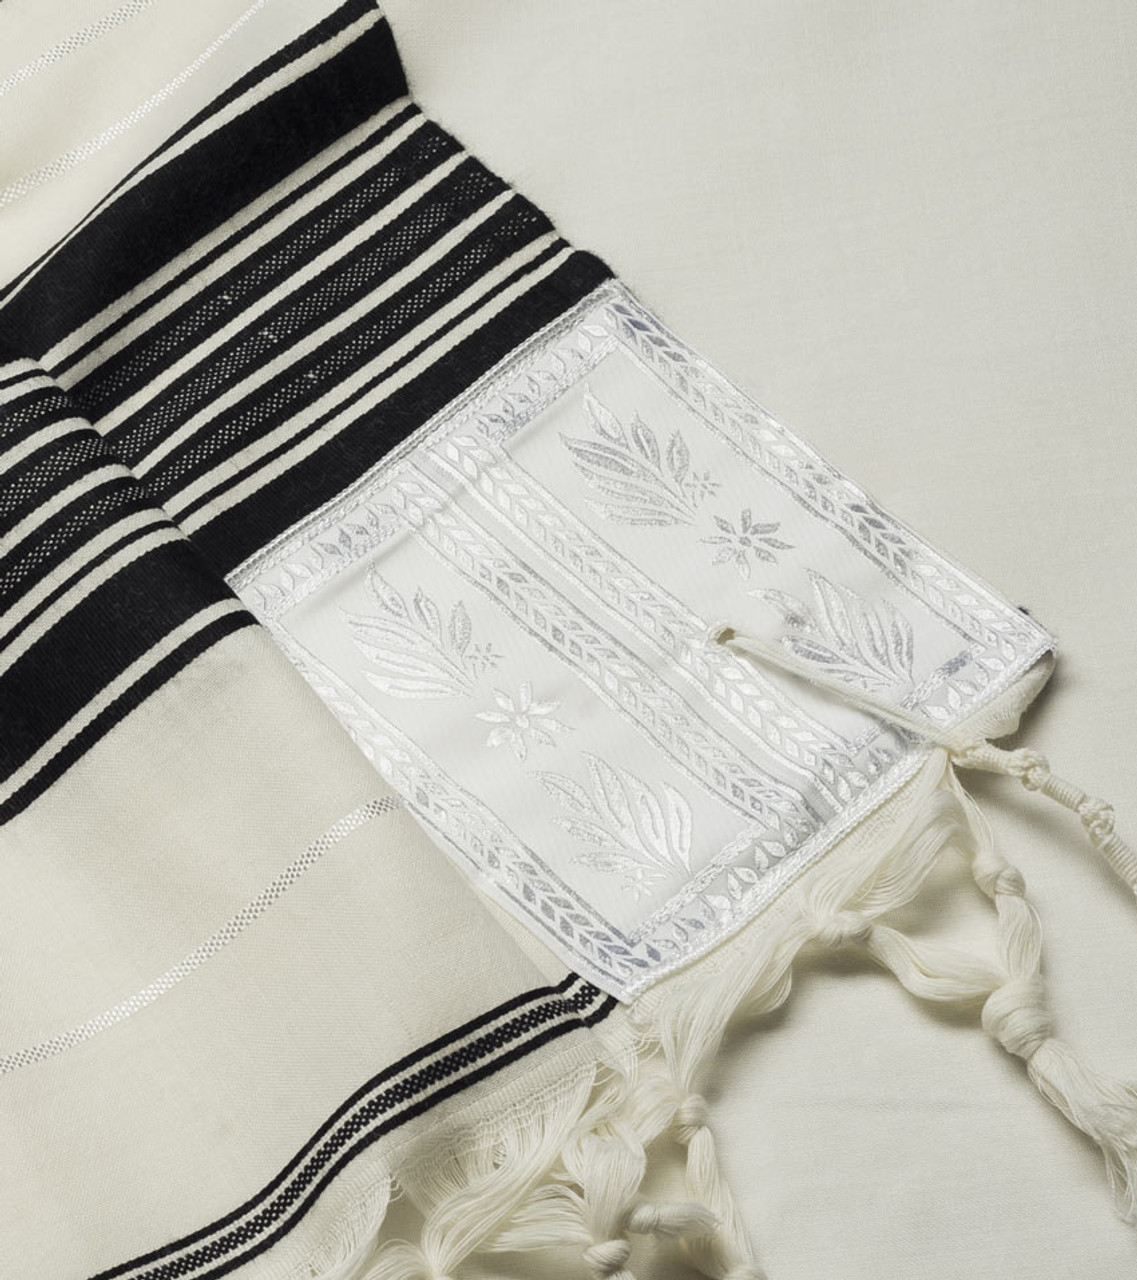 Yemenite Tallit with White-Silver